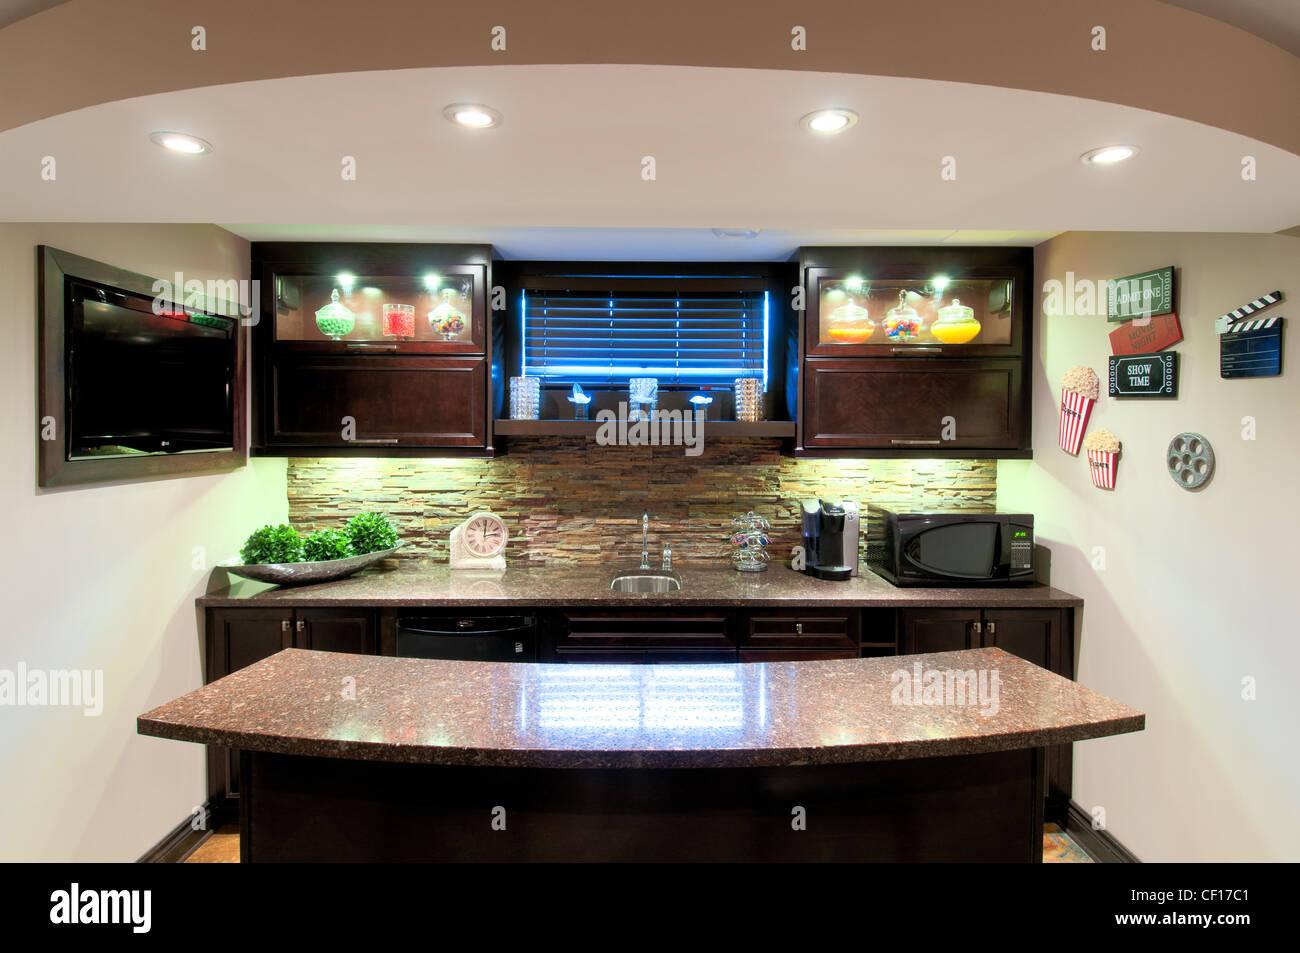 Mini Bar House Stockfotos & Mini Bar House Bilder - Alamy